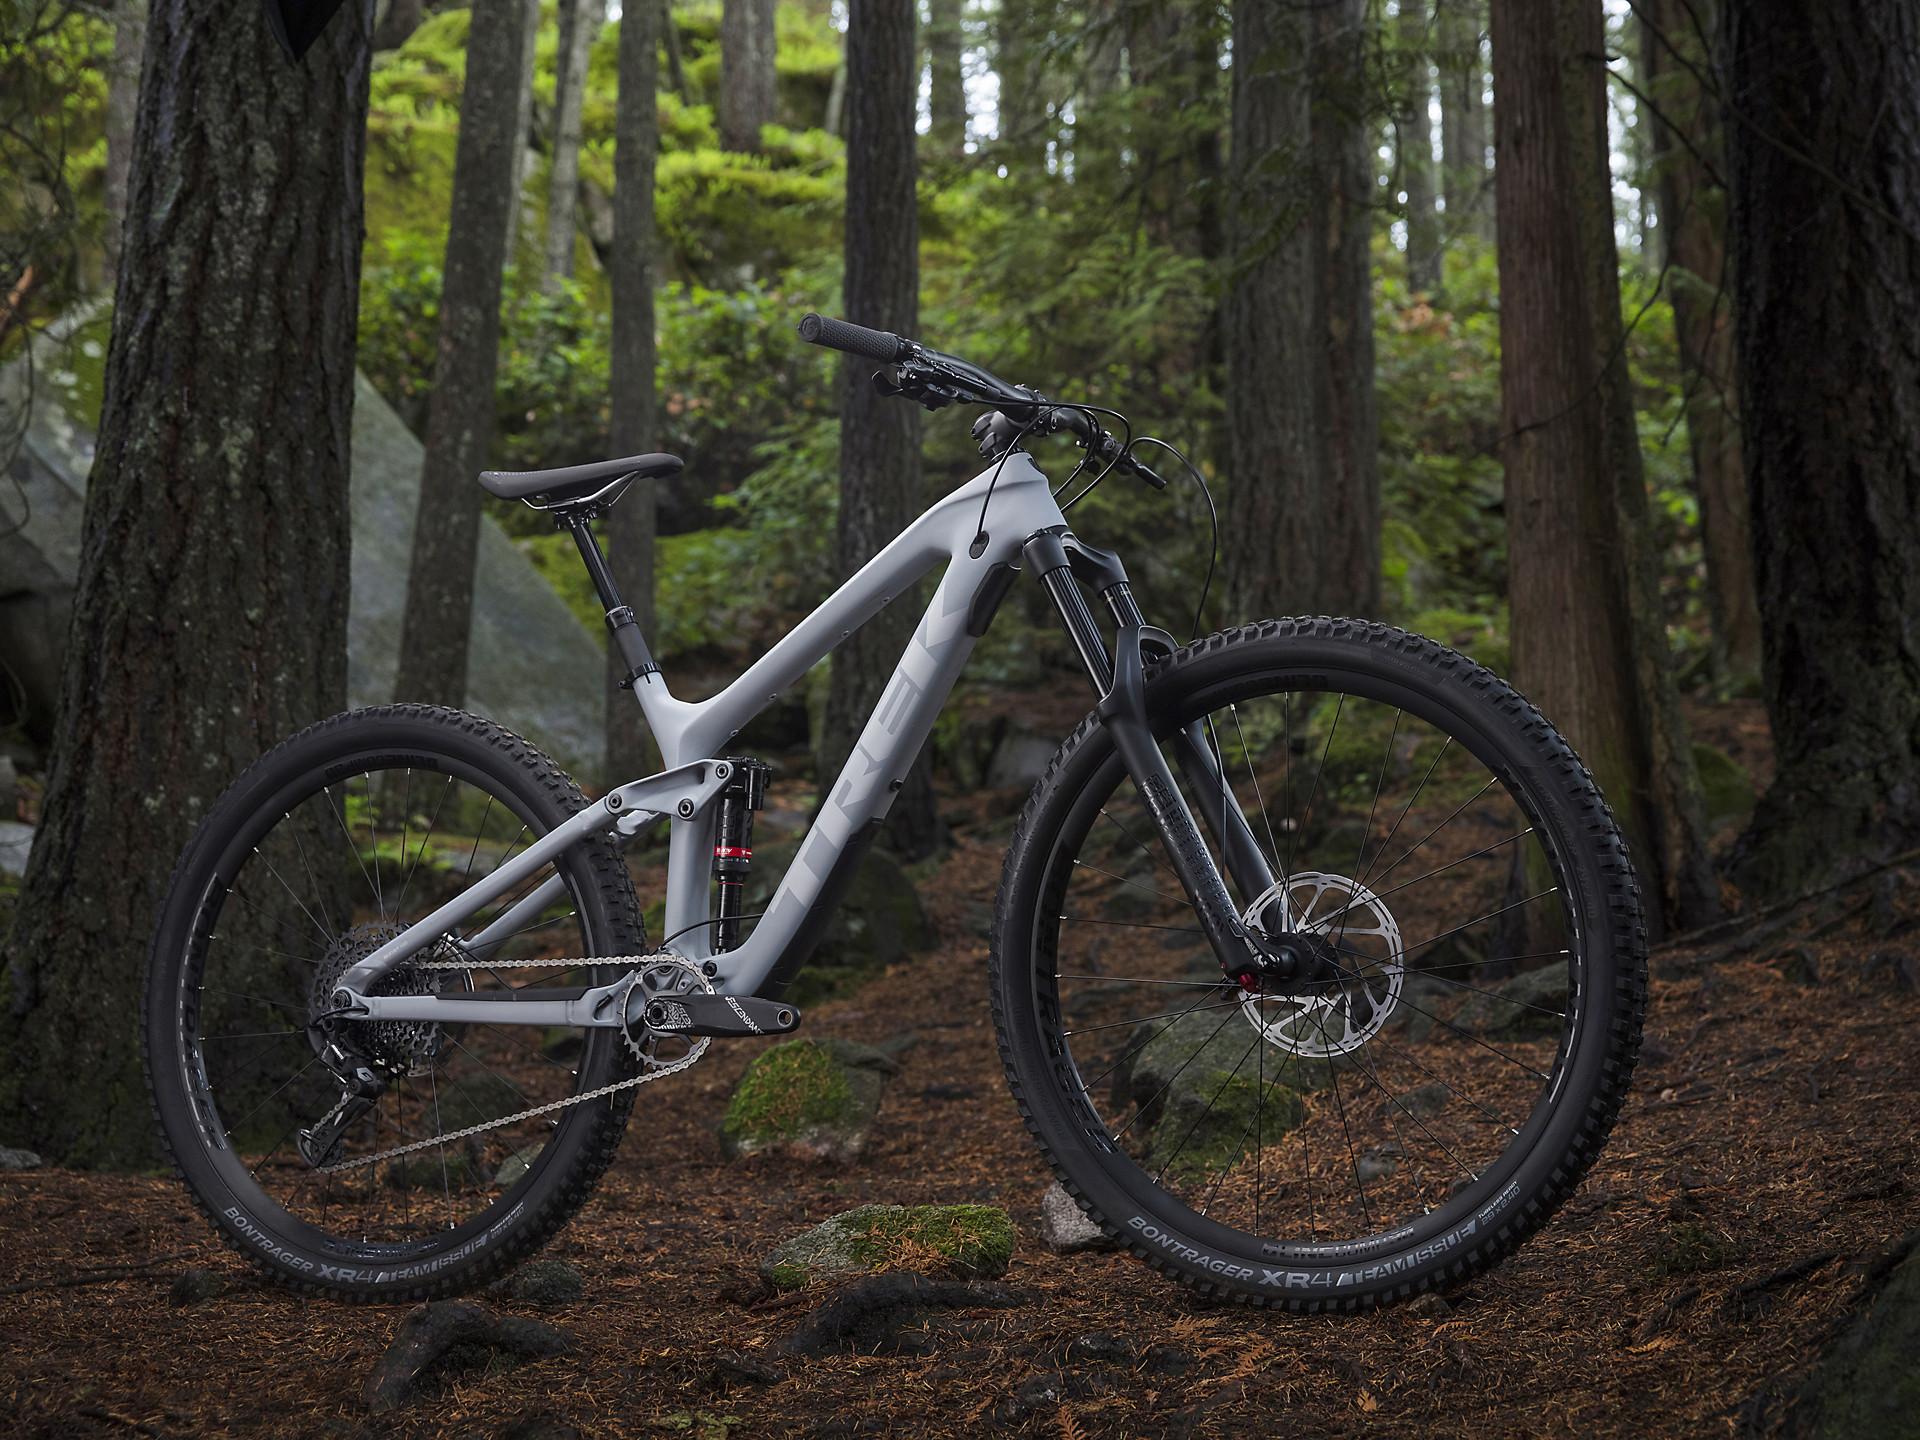 Crankset Bolts Crank Bolts Bike Chainring Bolts Bicycle Crank Screws Nut Fad